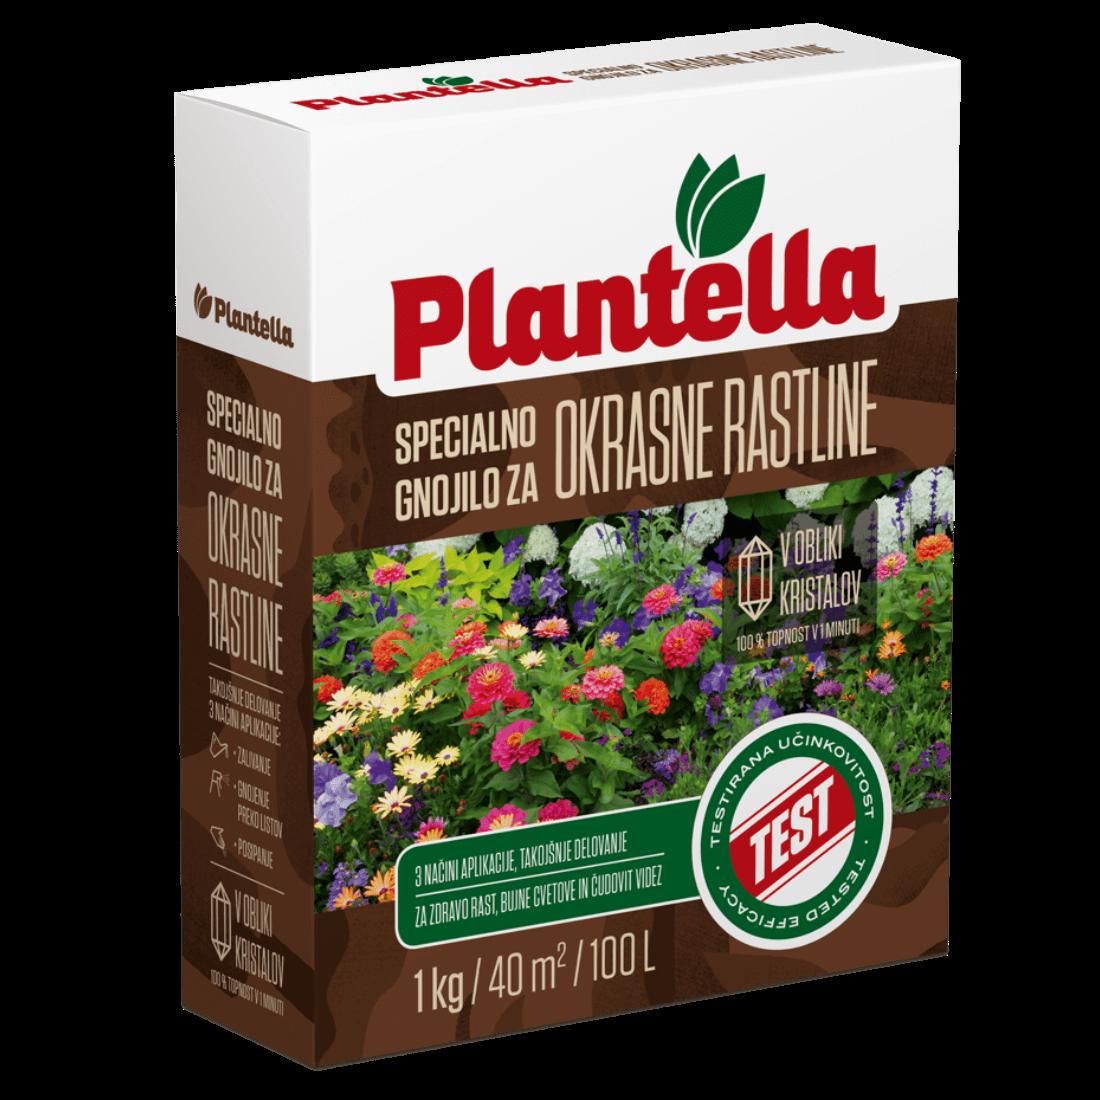 Plantella_Specialno-gnojilo-okrasne-rastline_1kg_SI